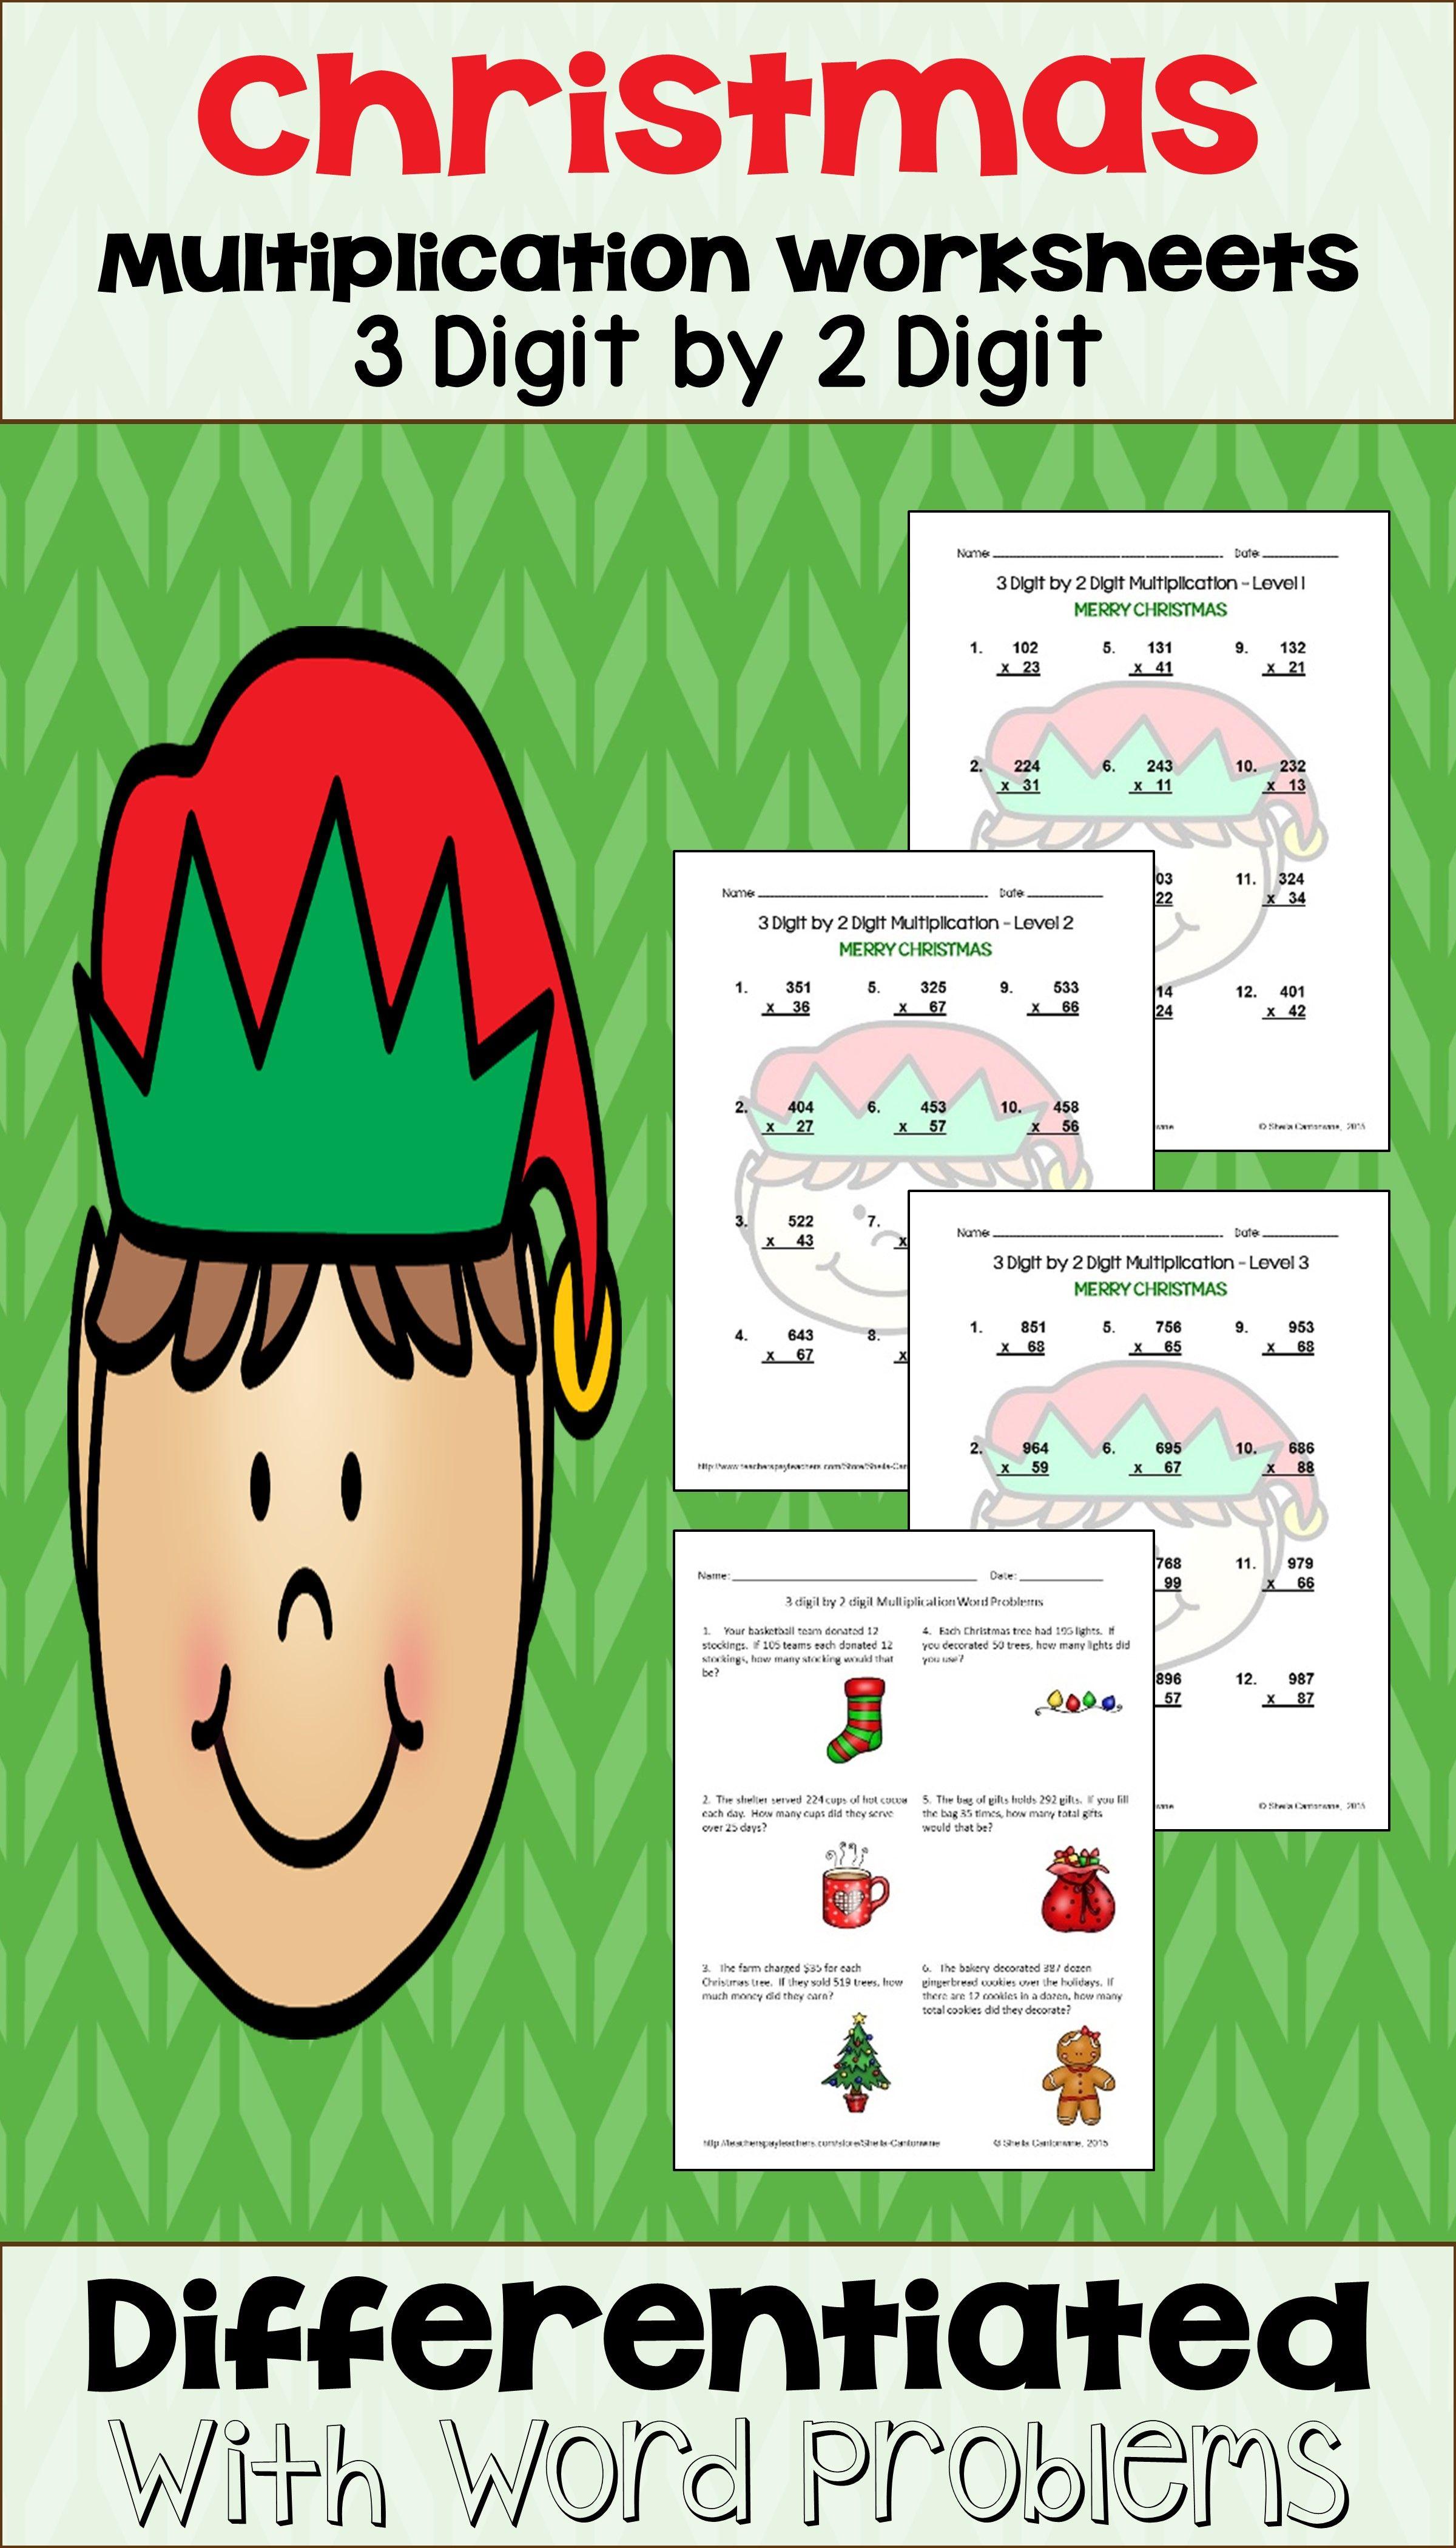 Christmas 3 Digit By 2 Digit Multiplication Worksheets